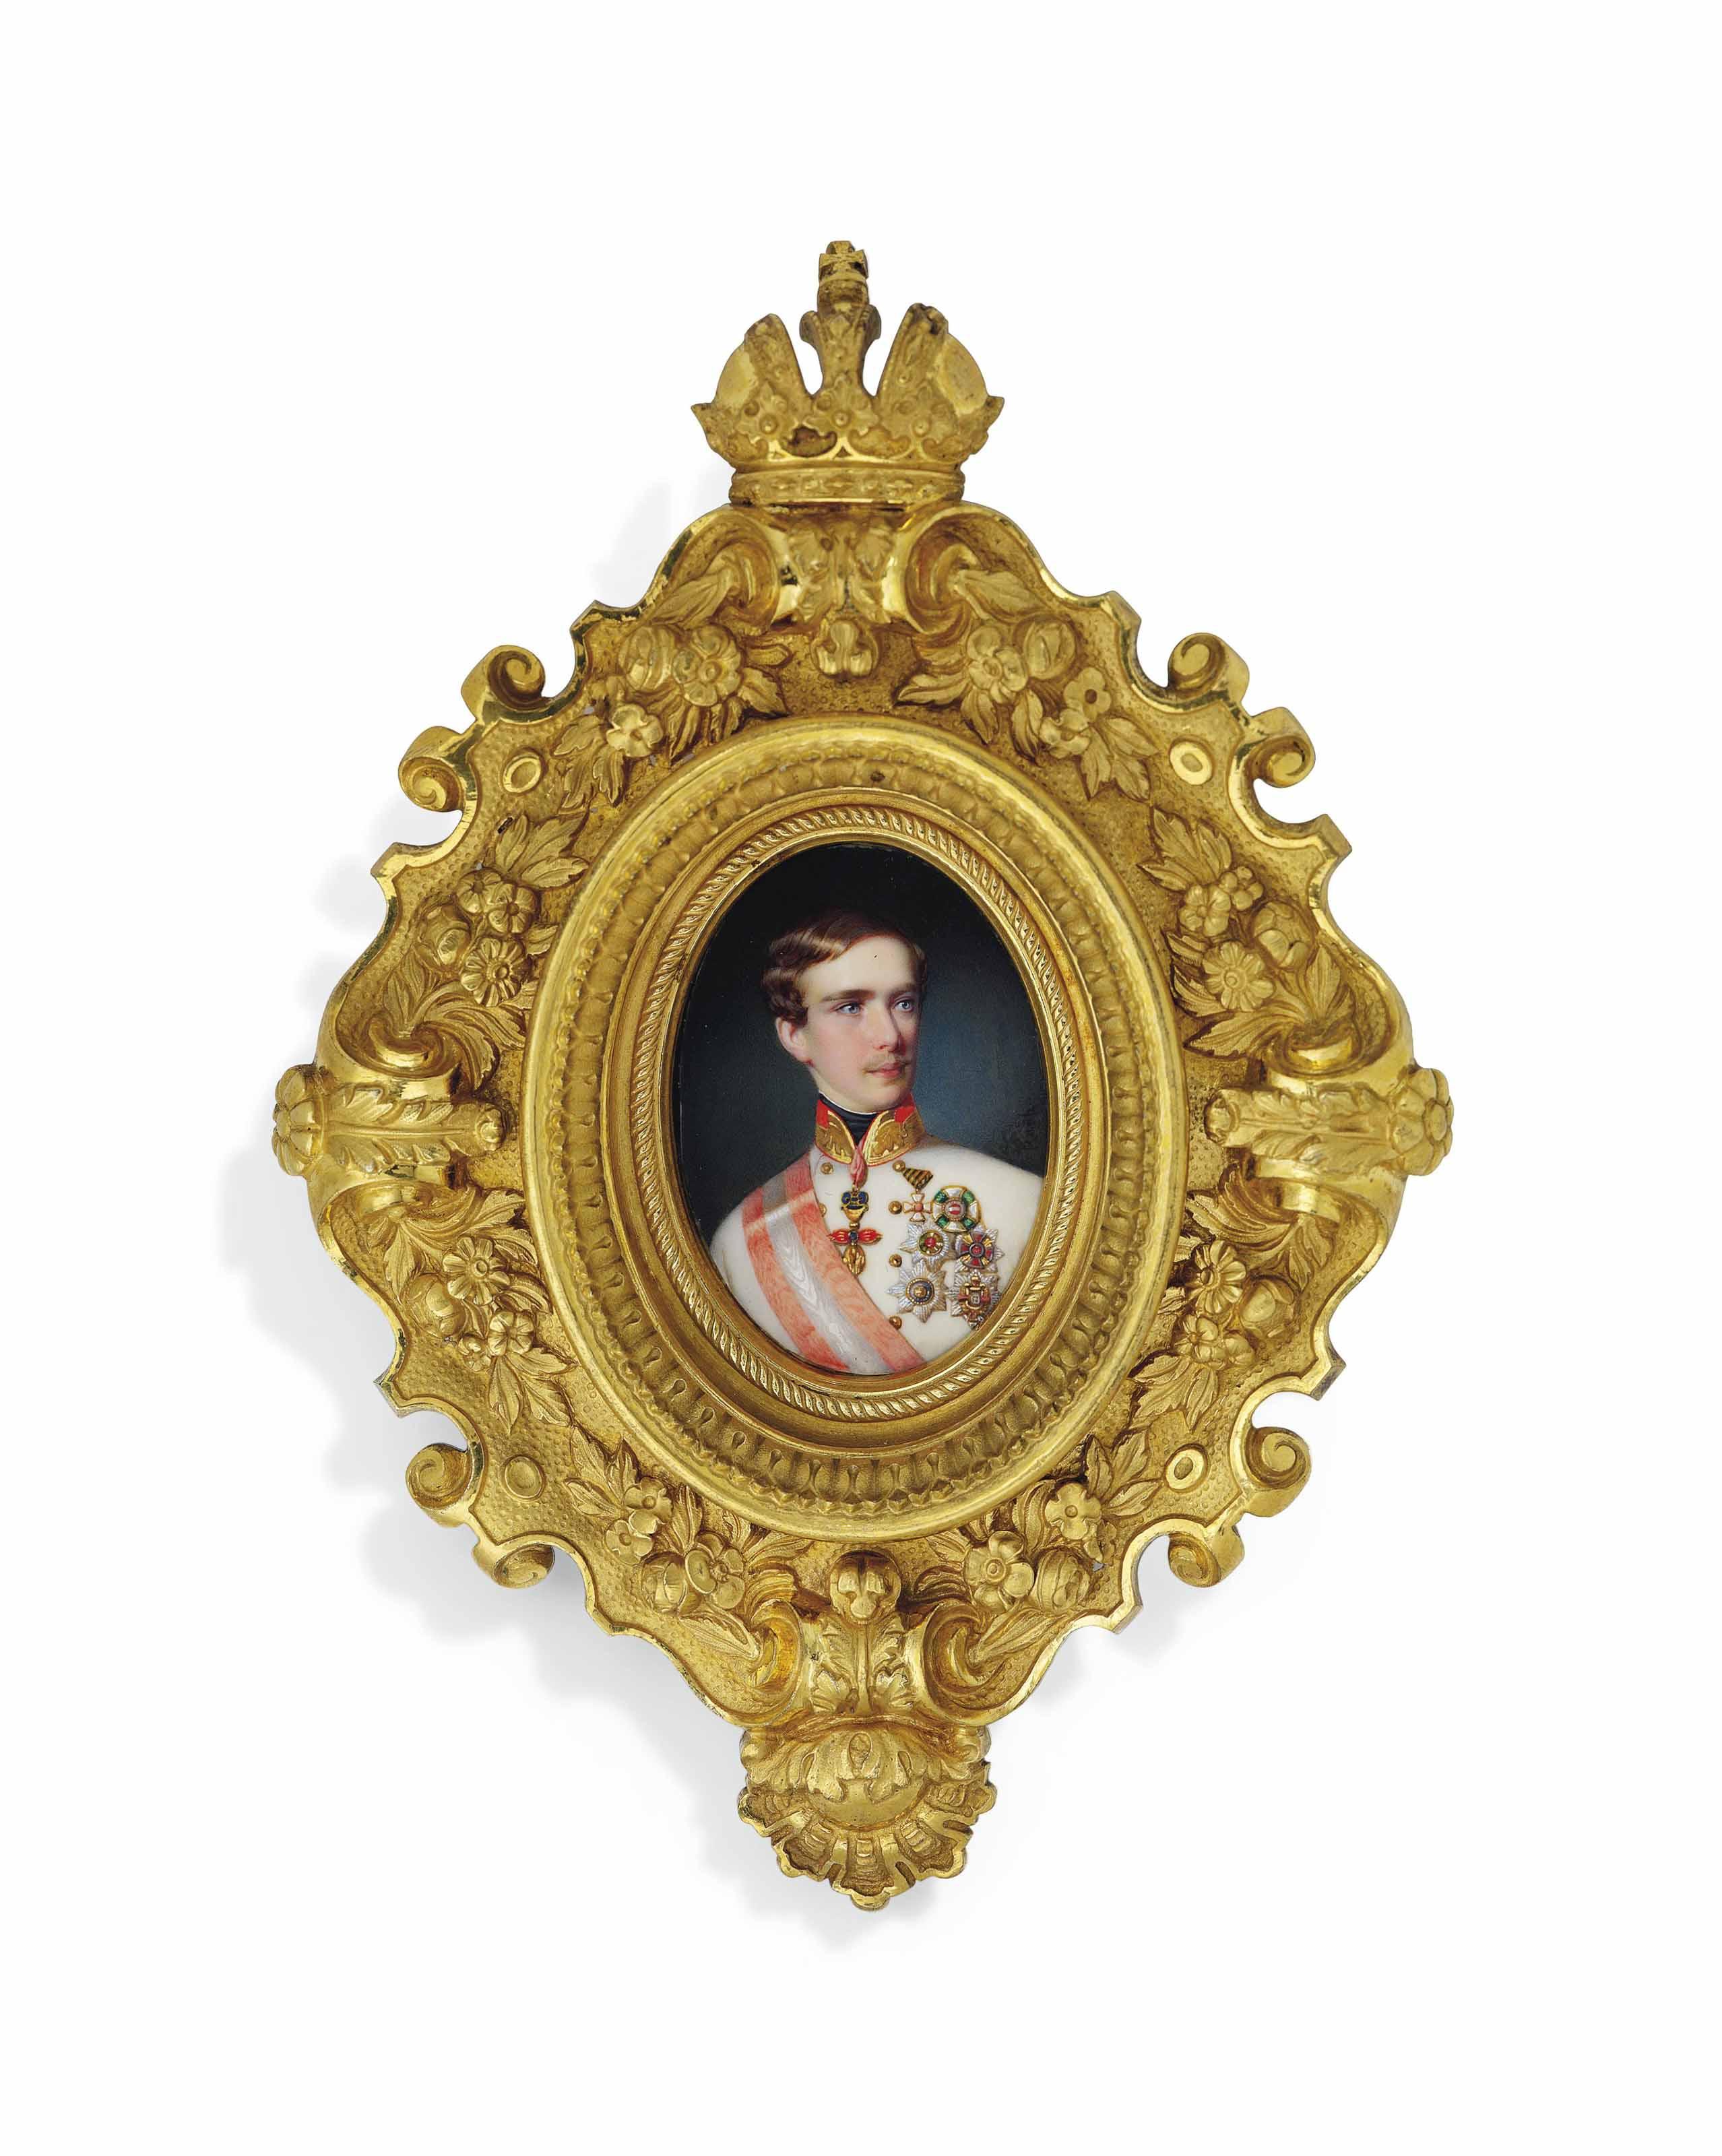 GEORG RAAB (AUSTRIAN, 1821-1885)